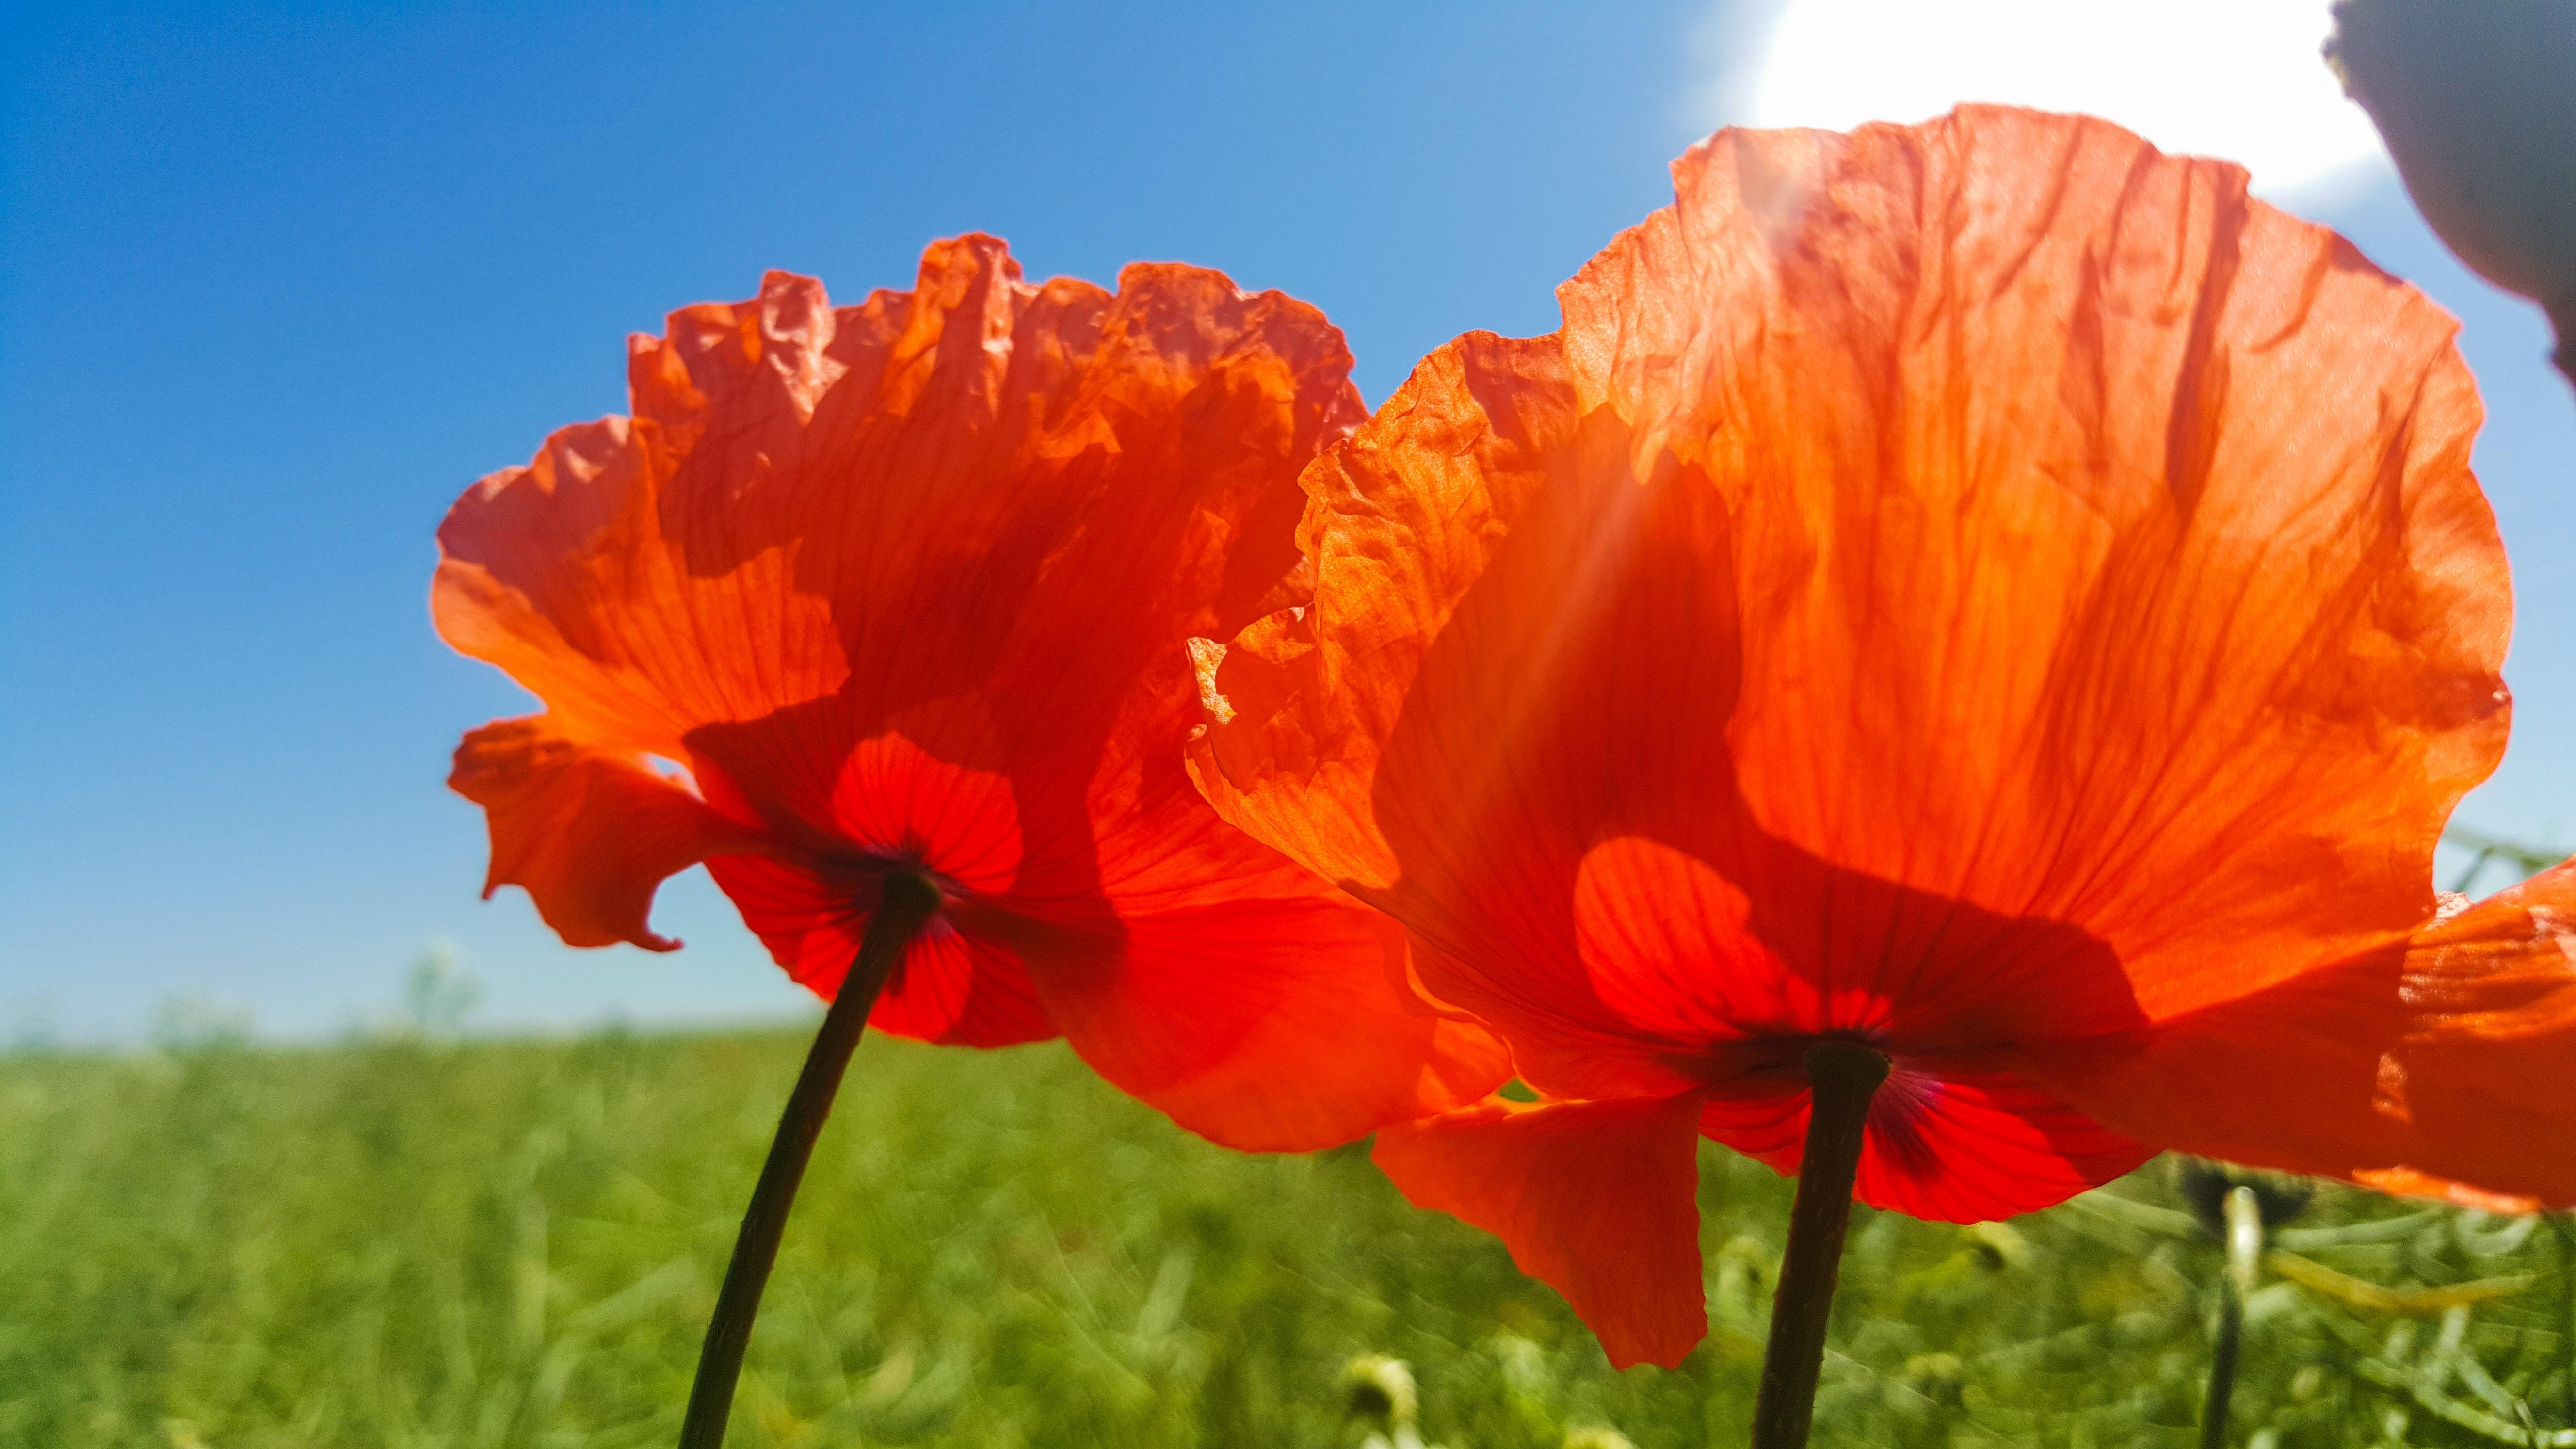 Free Photo Close Up Photo Of Orange Petaled Flower Grass